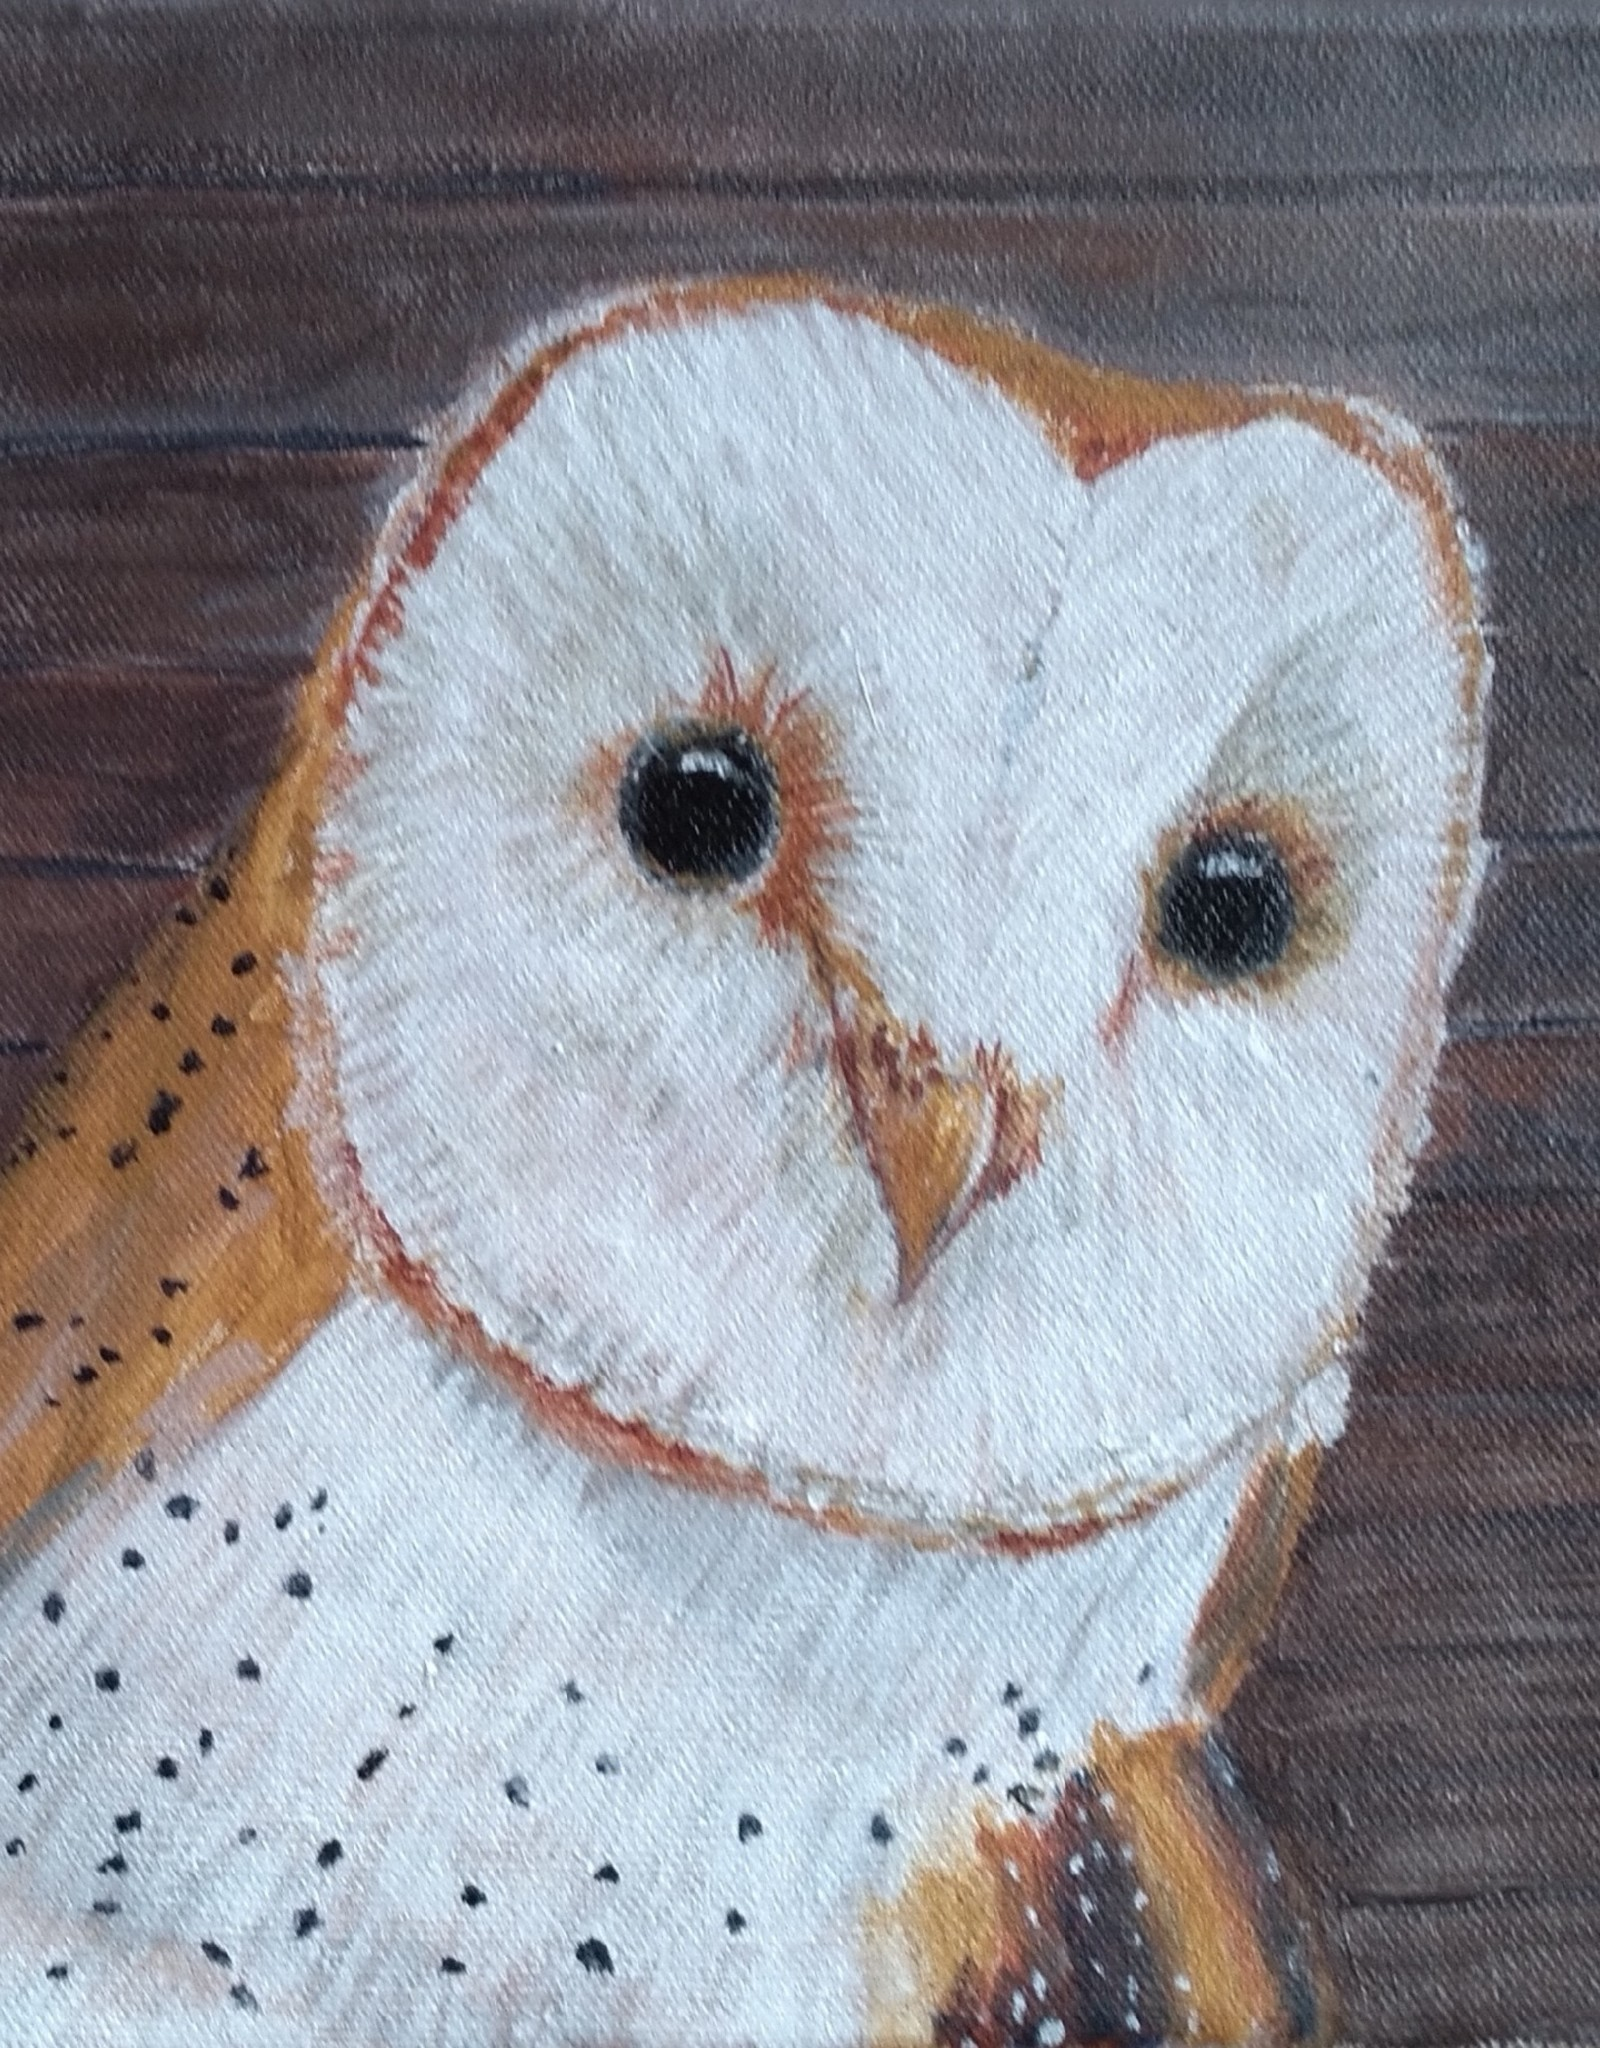 Jim G Acrylic Art Class Barn Owl Sat March 13 10:00 am to 12:30 pm